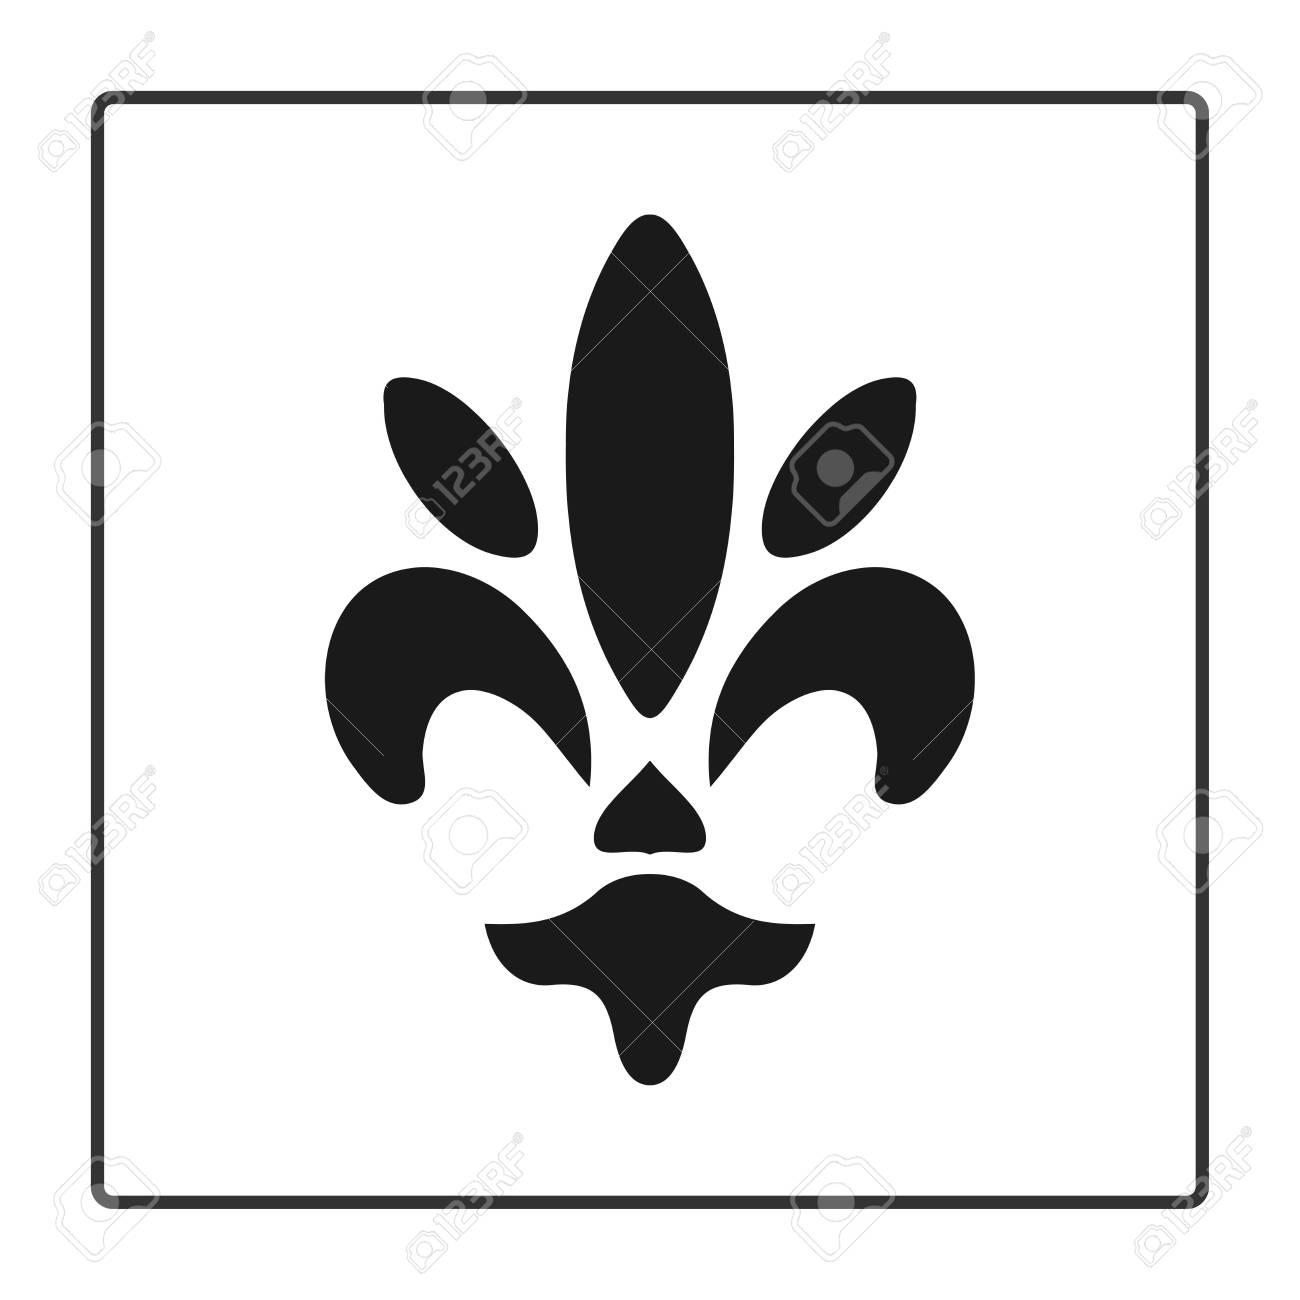 Fleur De Lis Symbol Silhouette Heraldic Symbol Vector